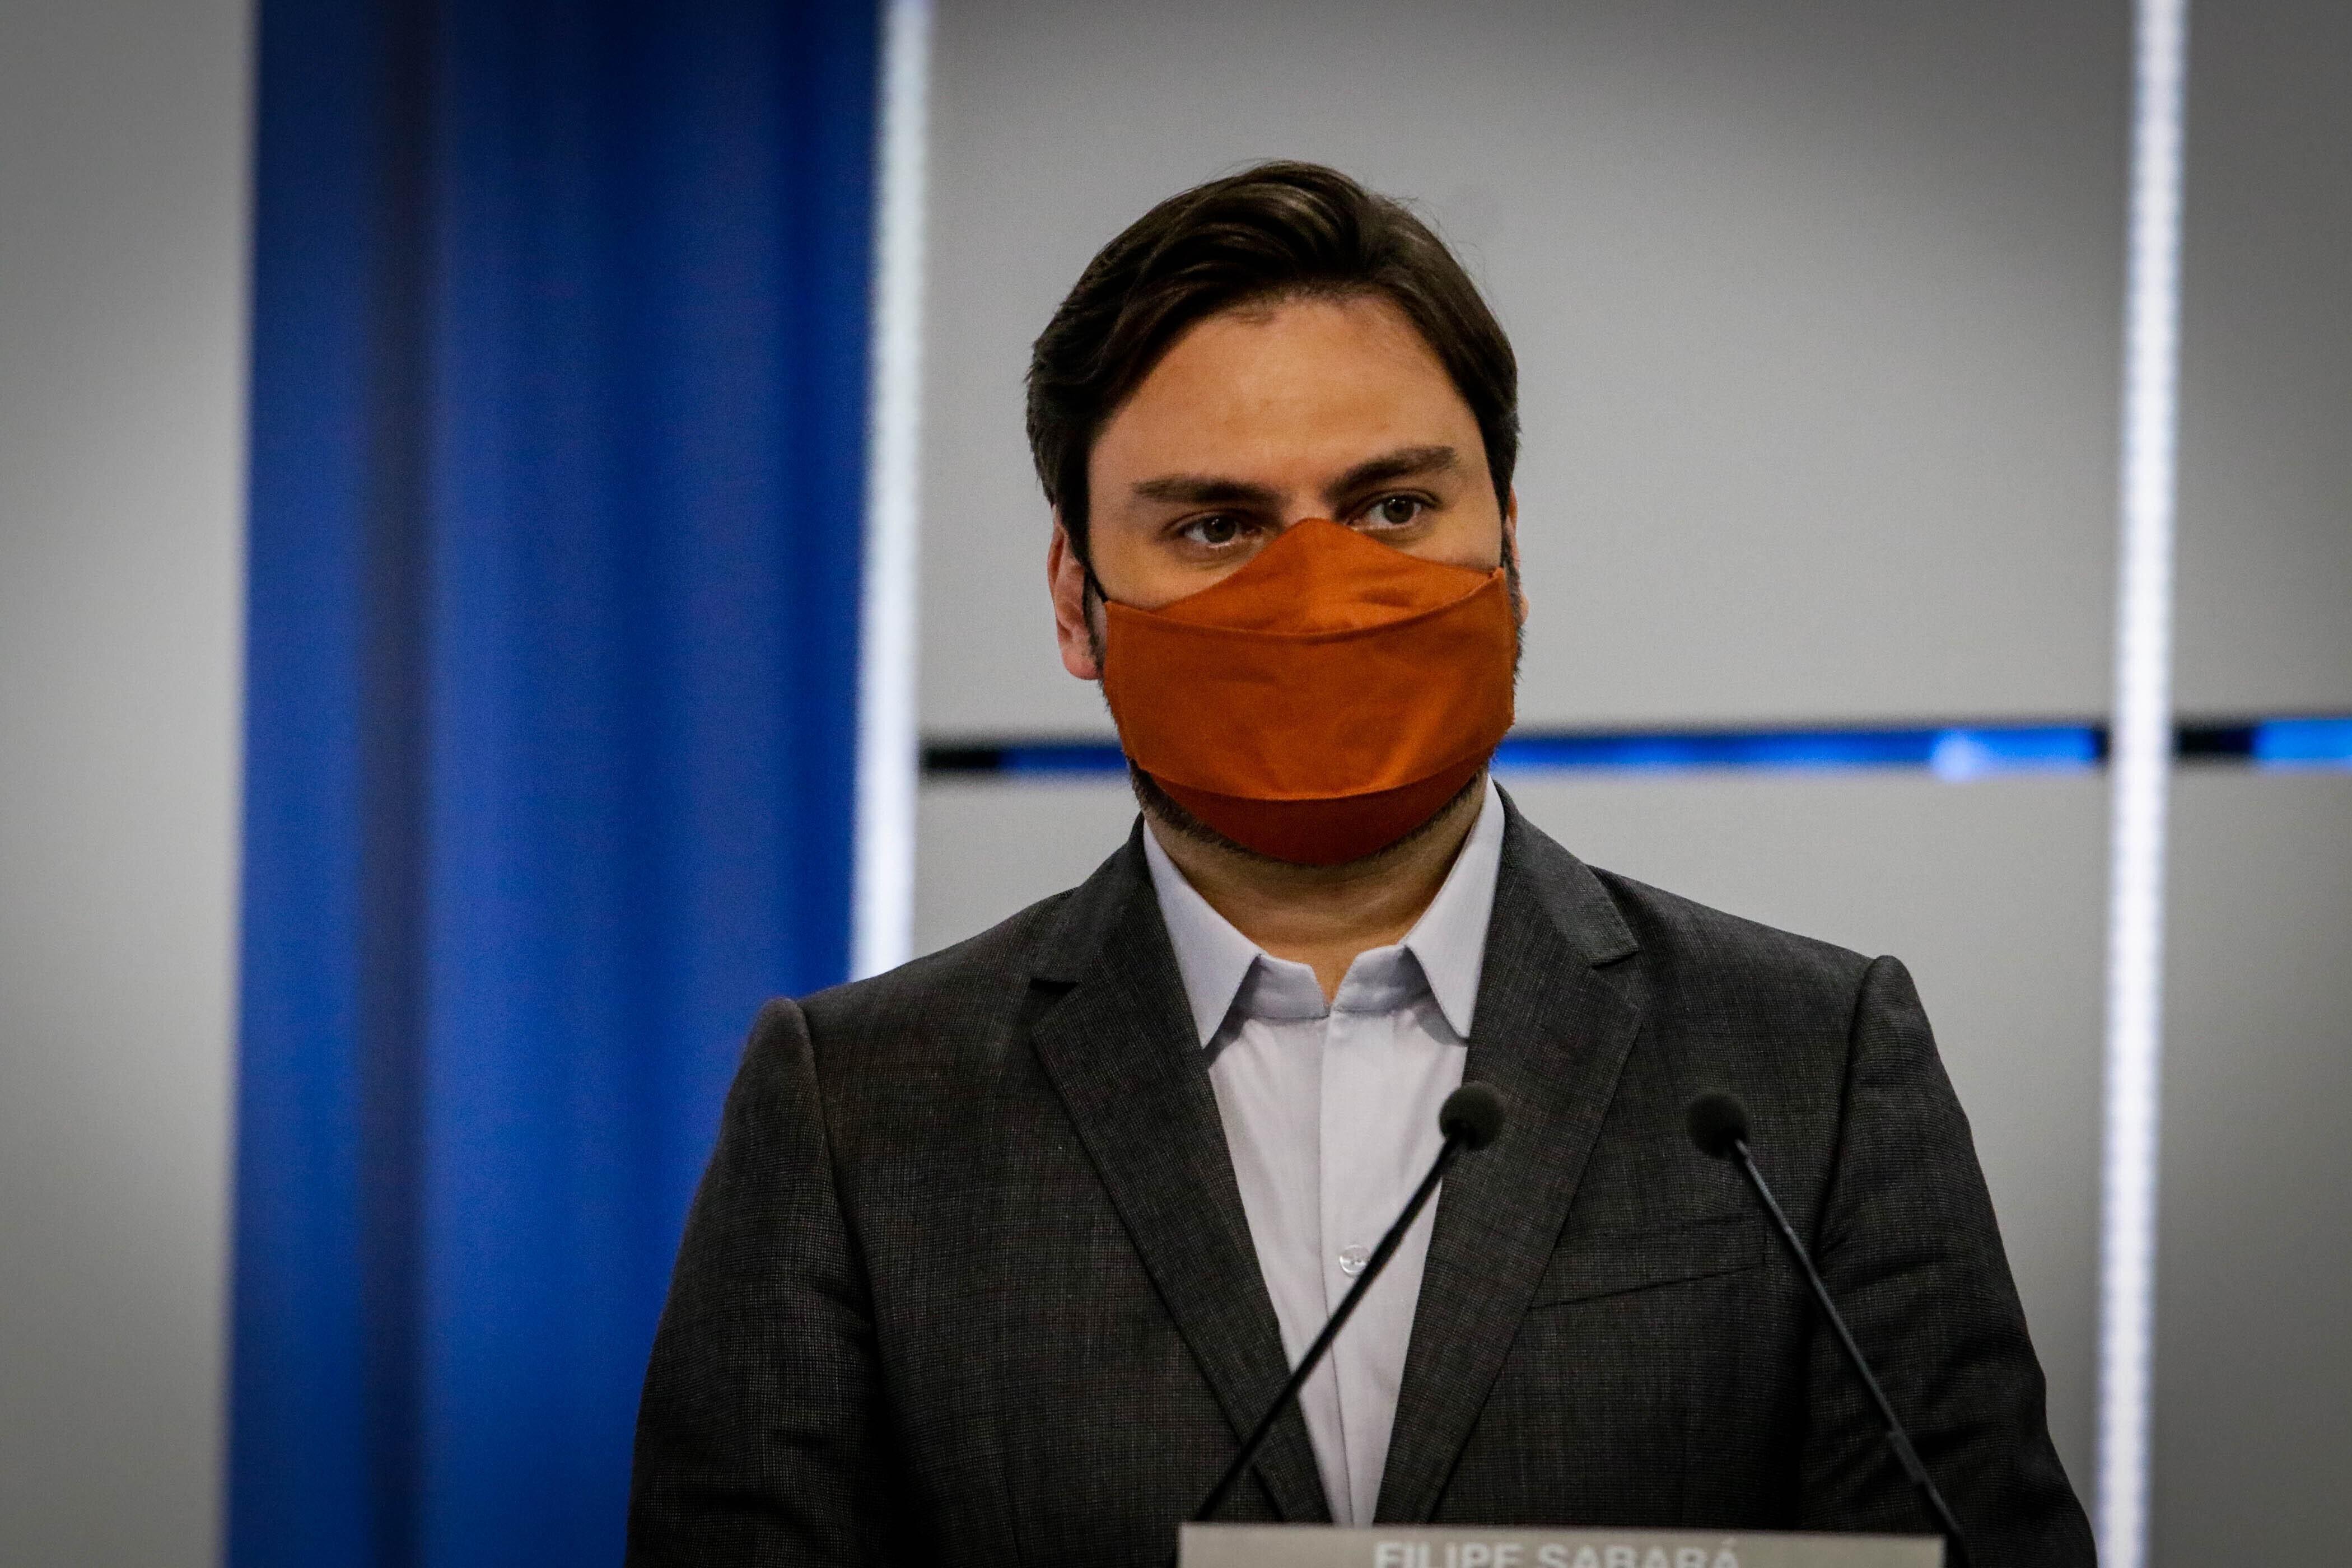 Justiça eleitoral indefere candidatura de Filipe Sabará à Prefeitura de SP